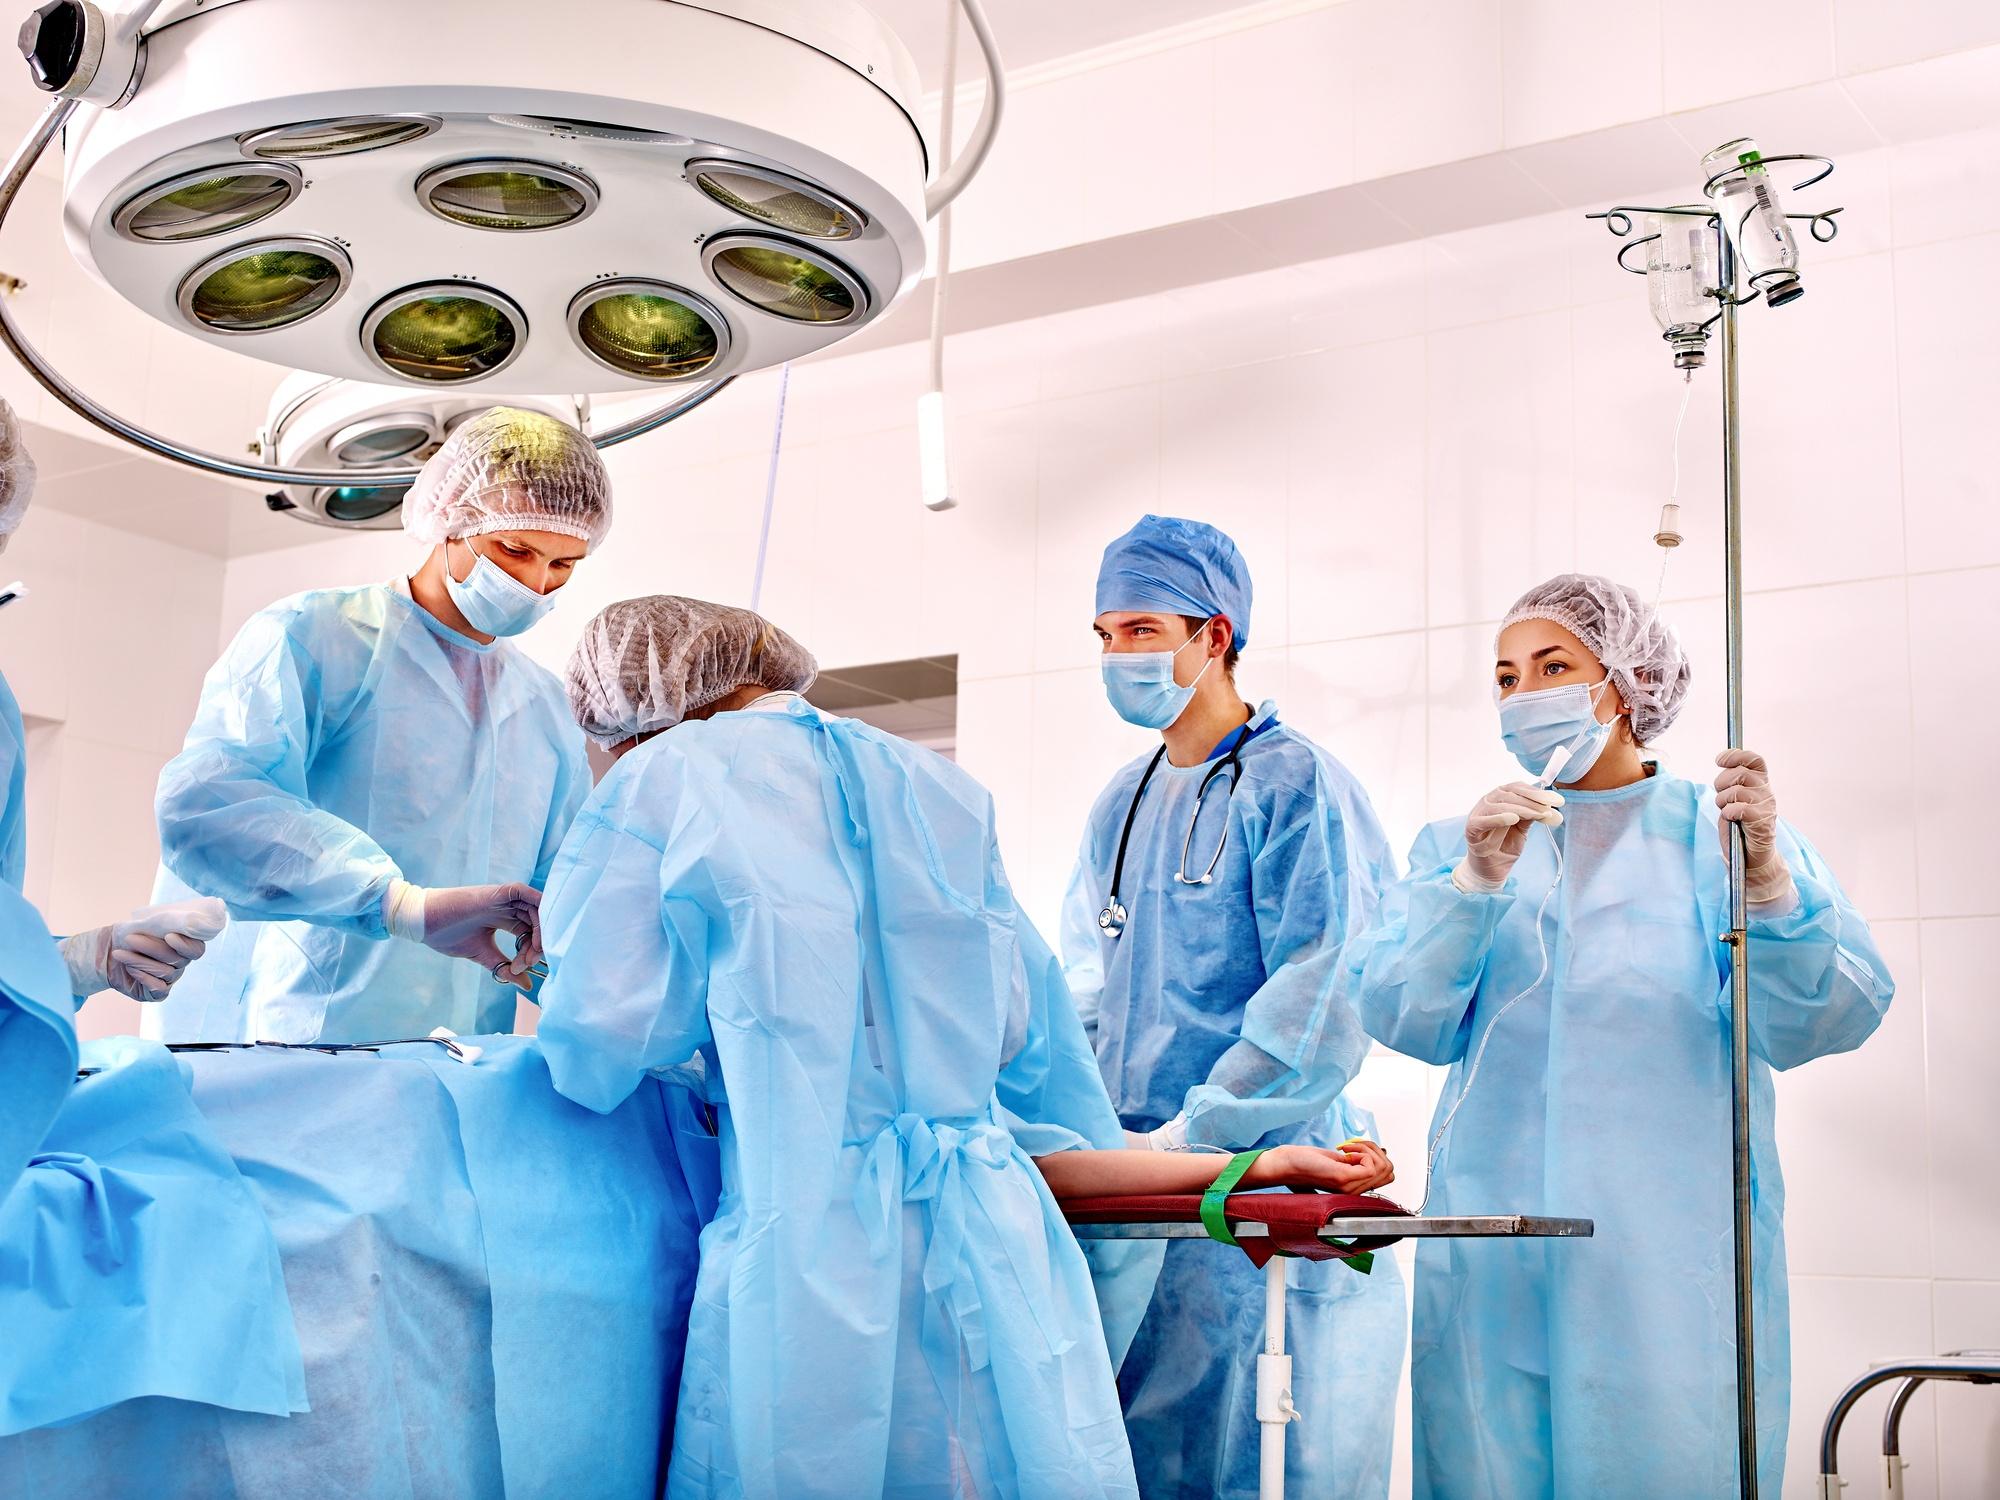 increase-efficiency-in-the-operating-room